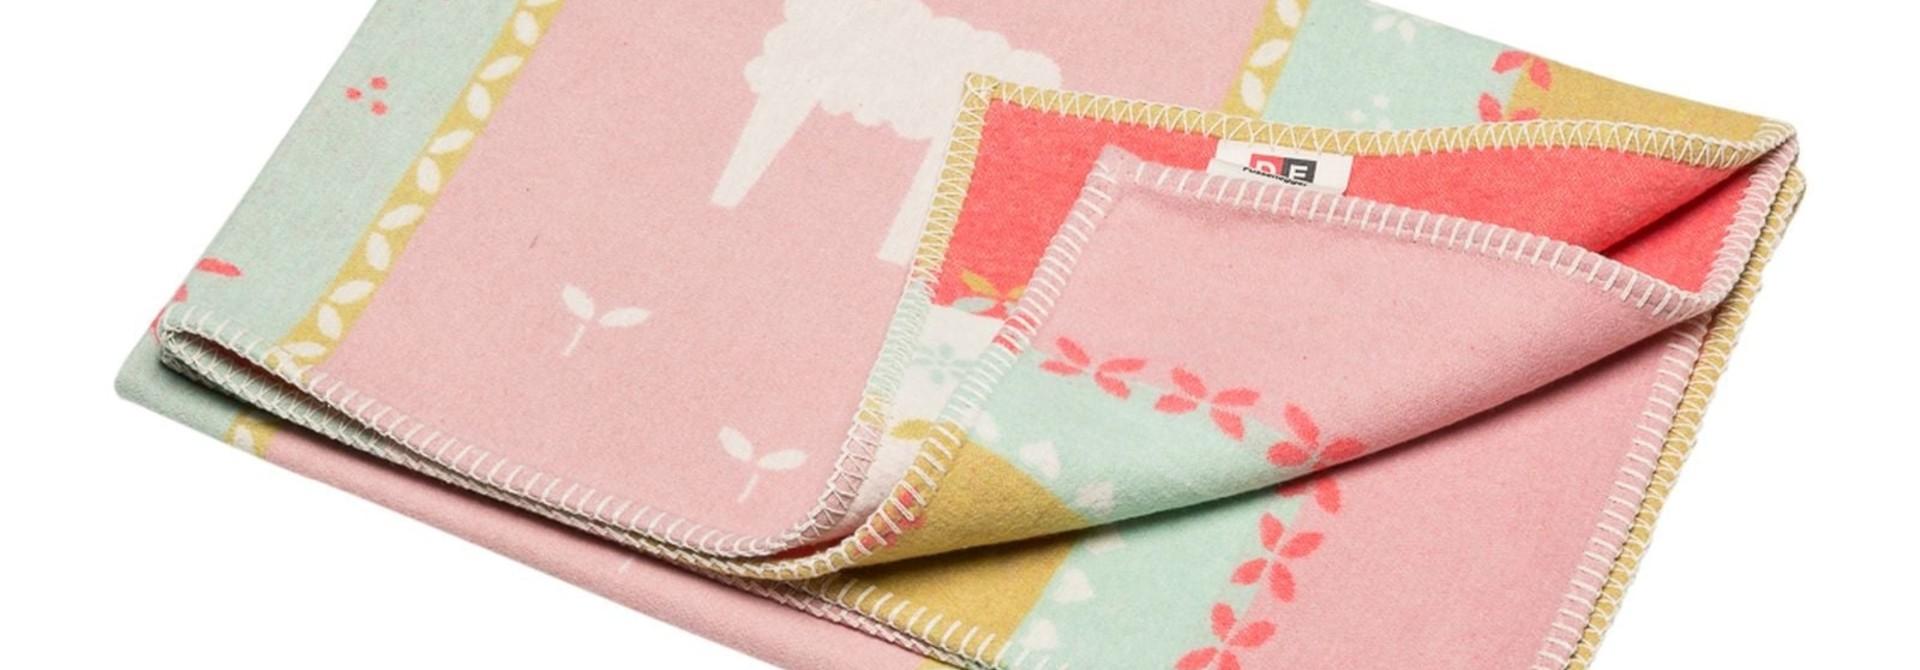 Blanket - Llamas - Rose